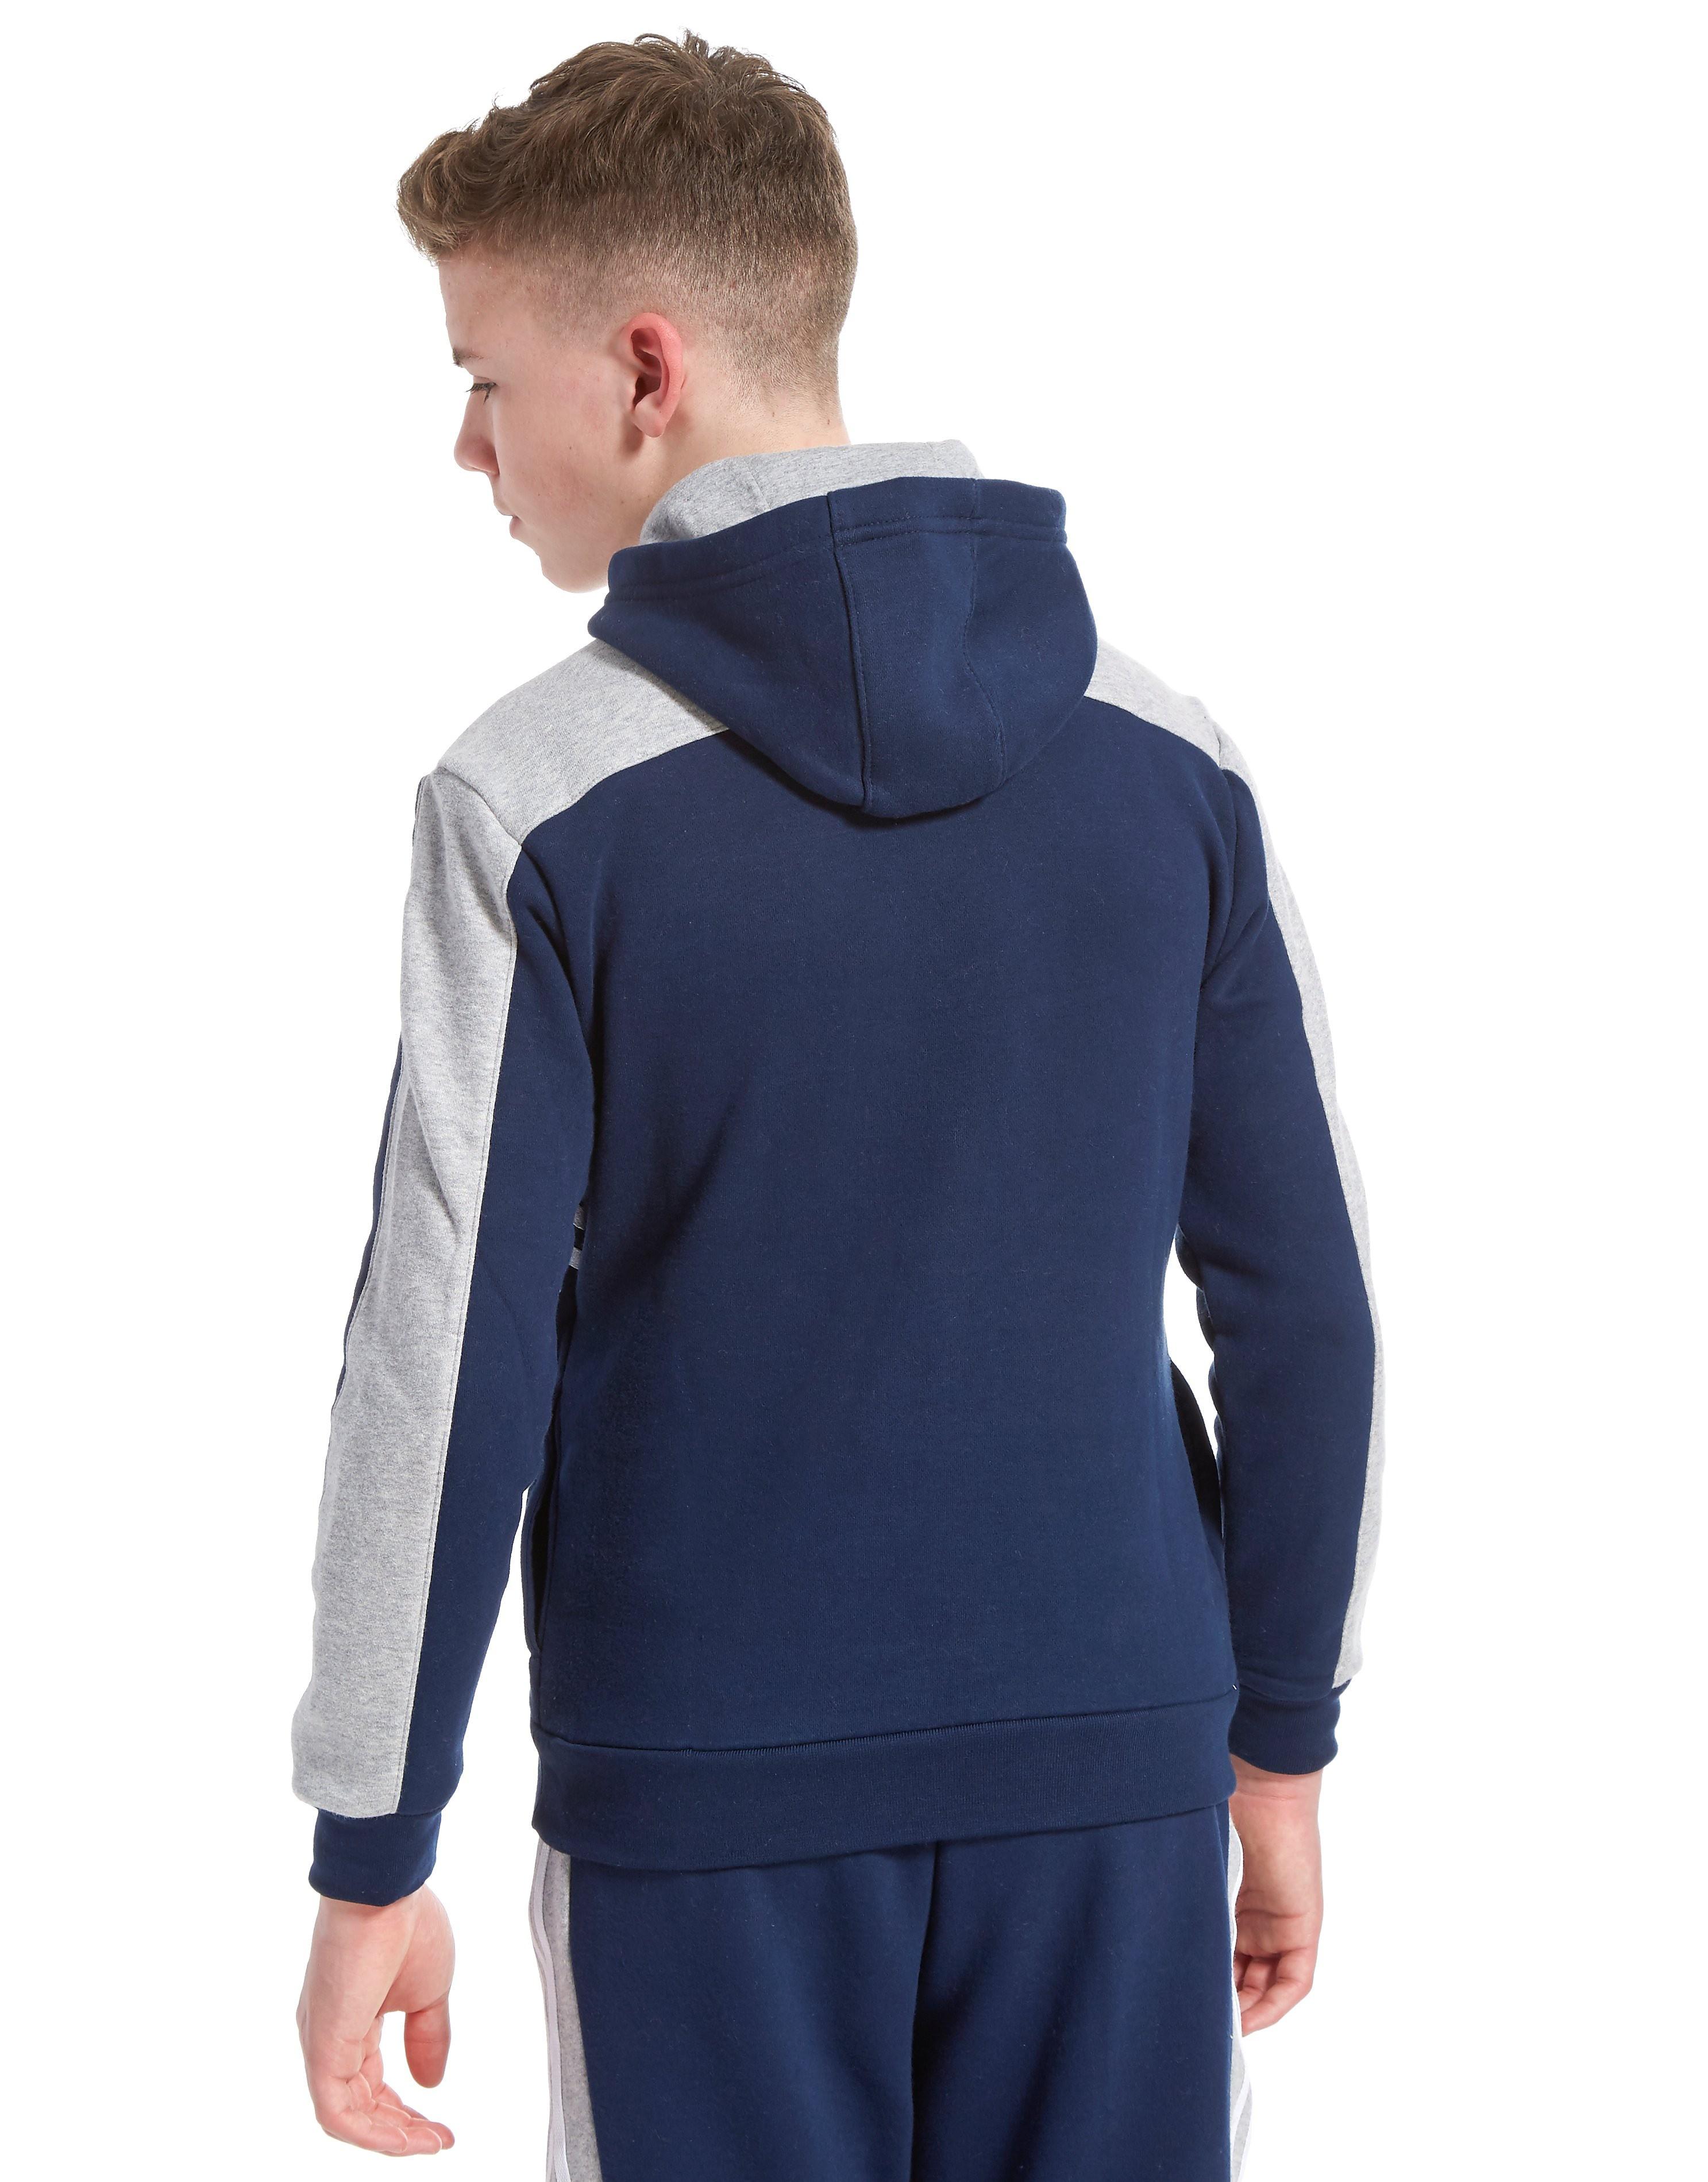 adidas Originals MOA Overhead Hoodie Junior Marineblau-Grau/Weiß